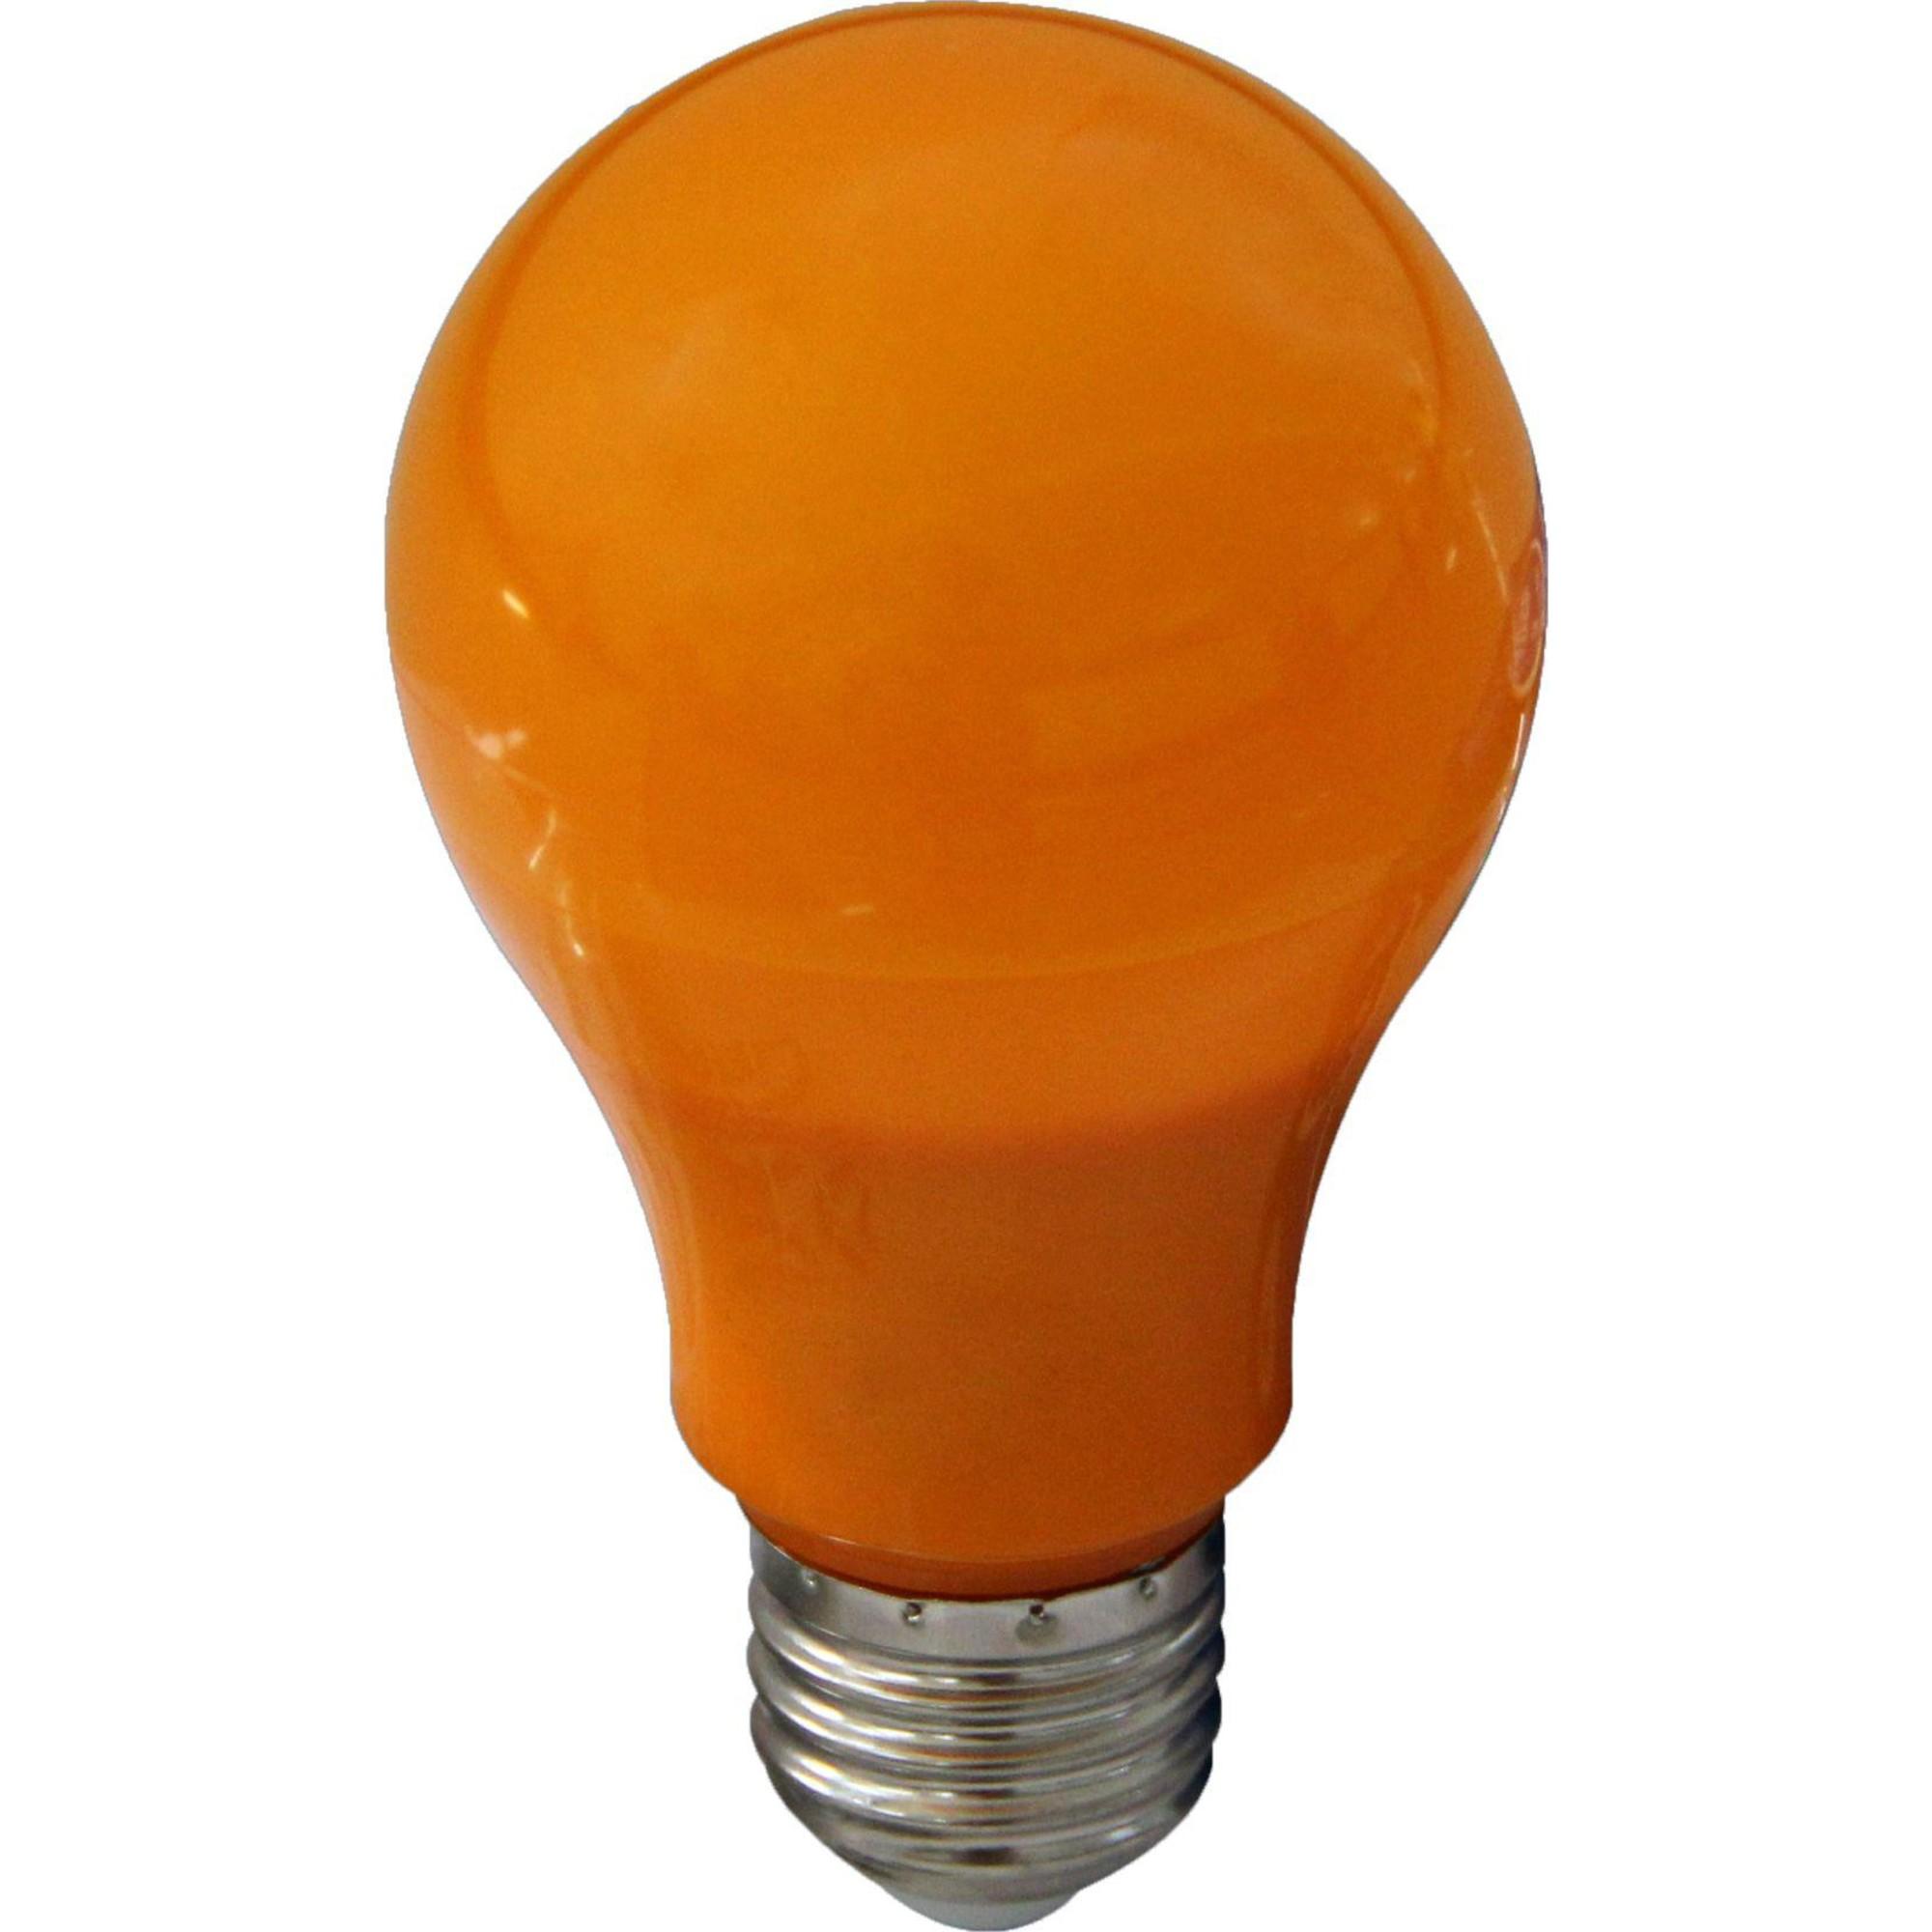 Лампа Ecola стандарт светодионая E27 12 Вт груша Лм теплый свет